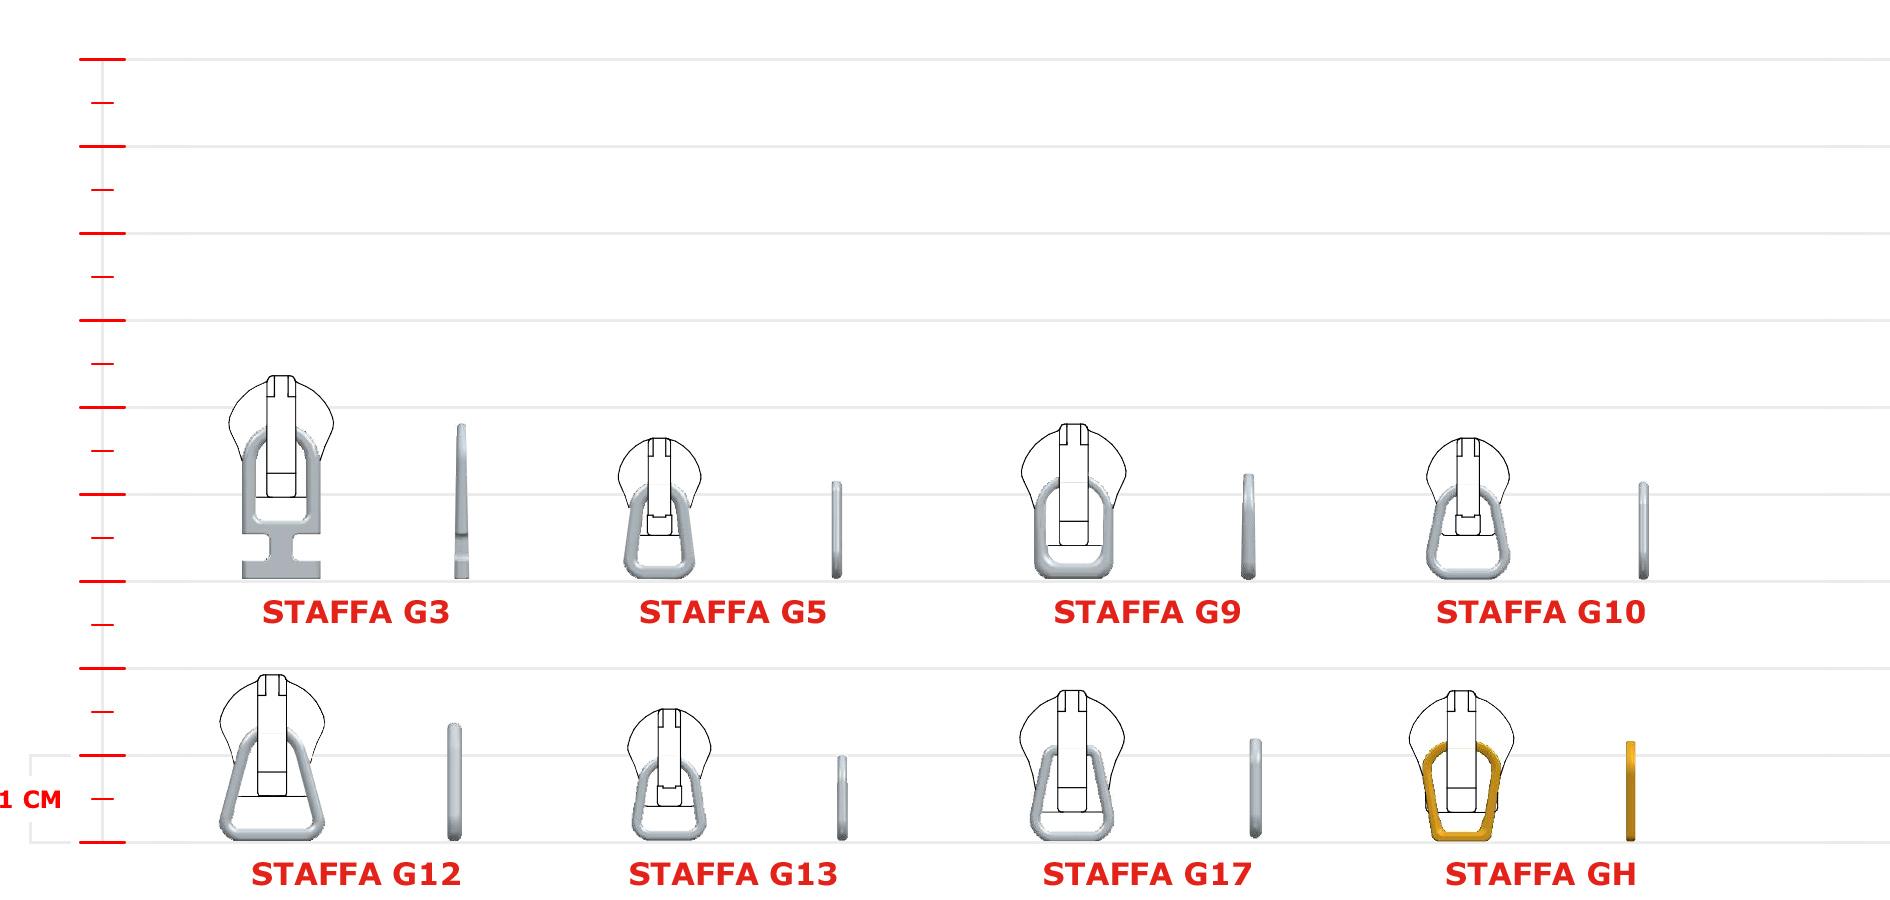 staffa-g